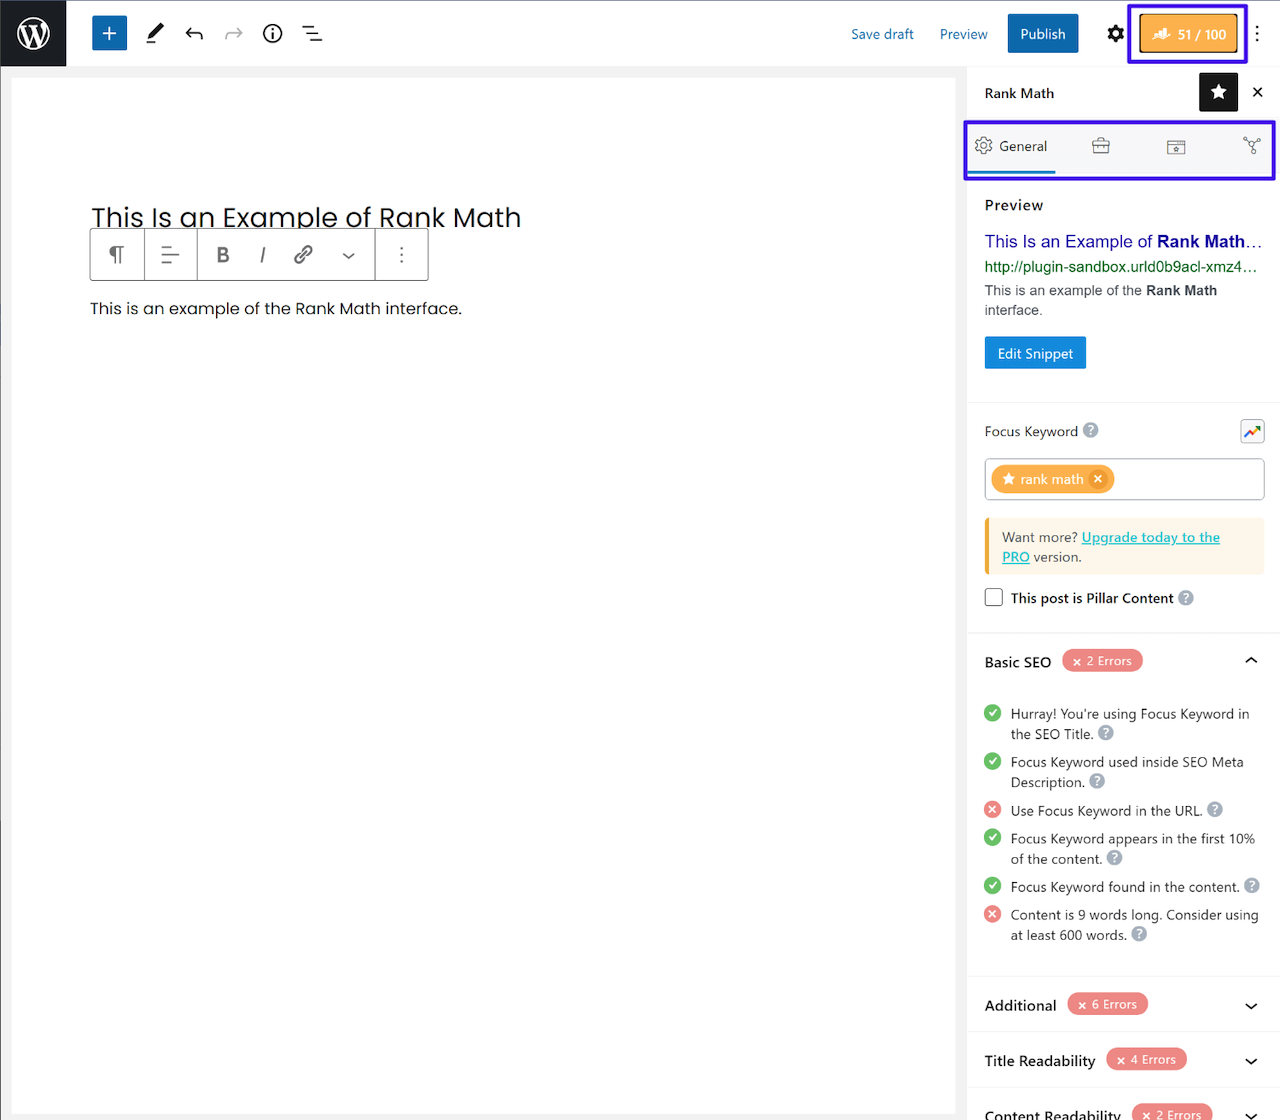 Rank Math User Interface